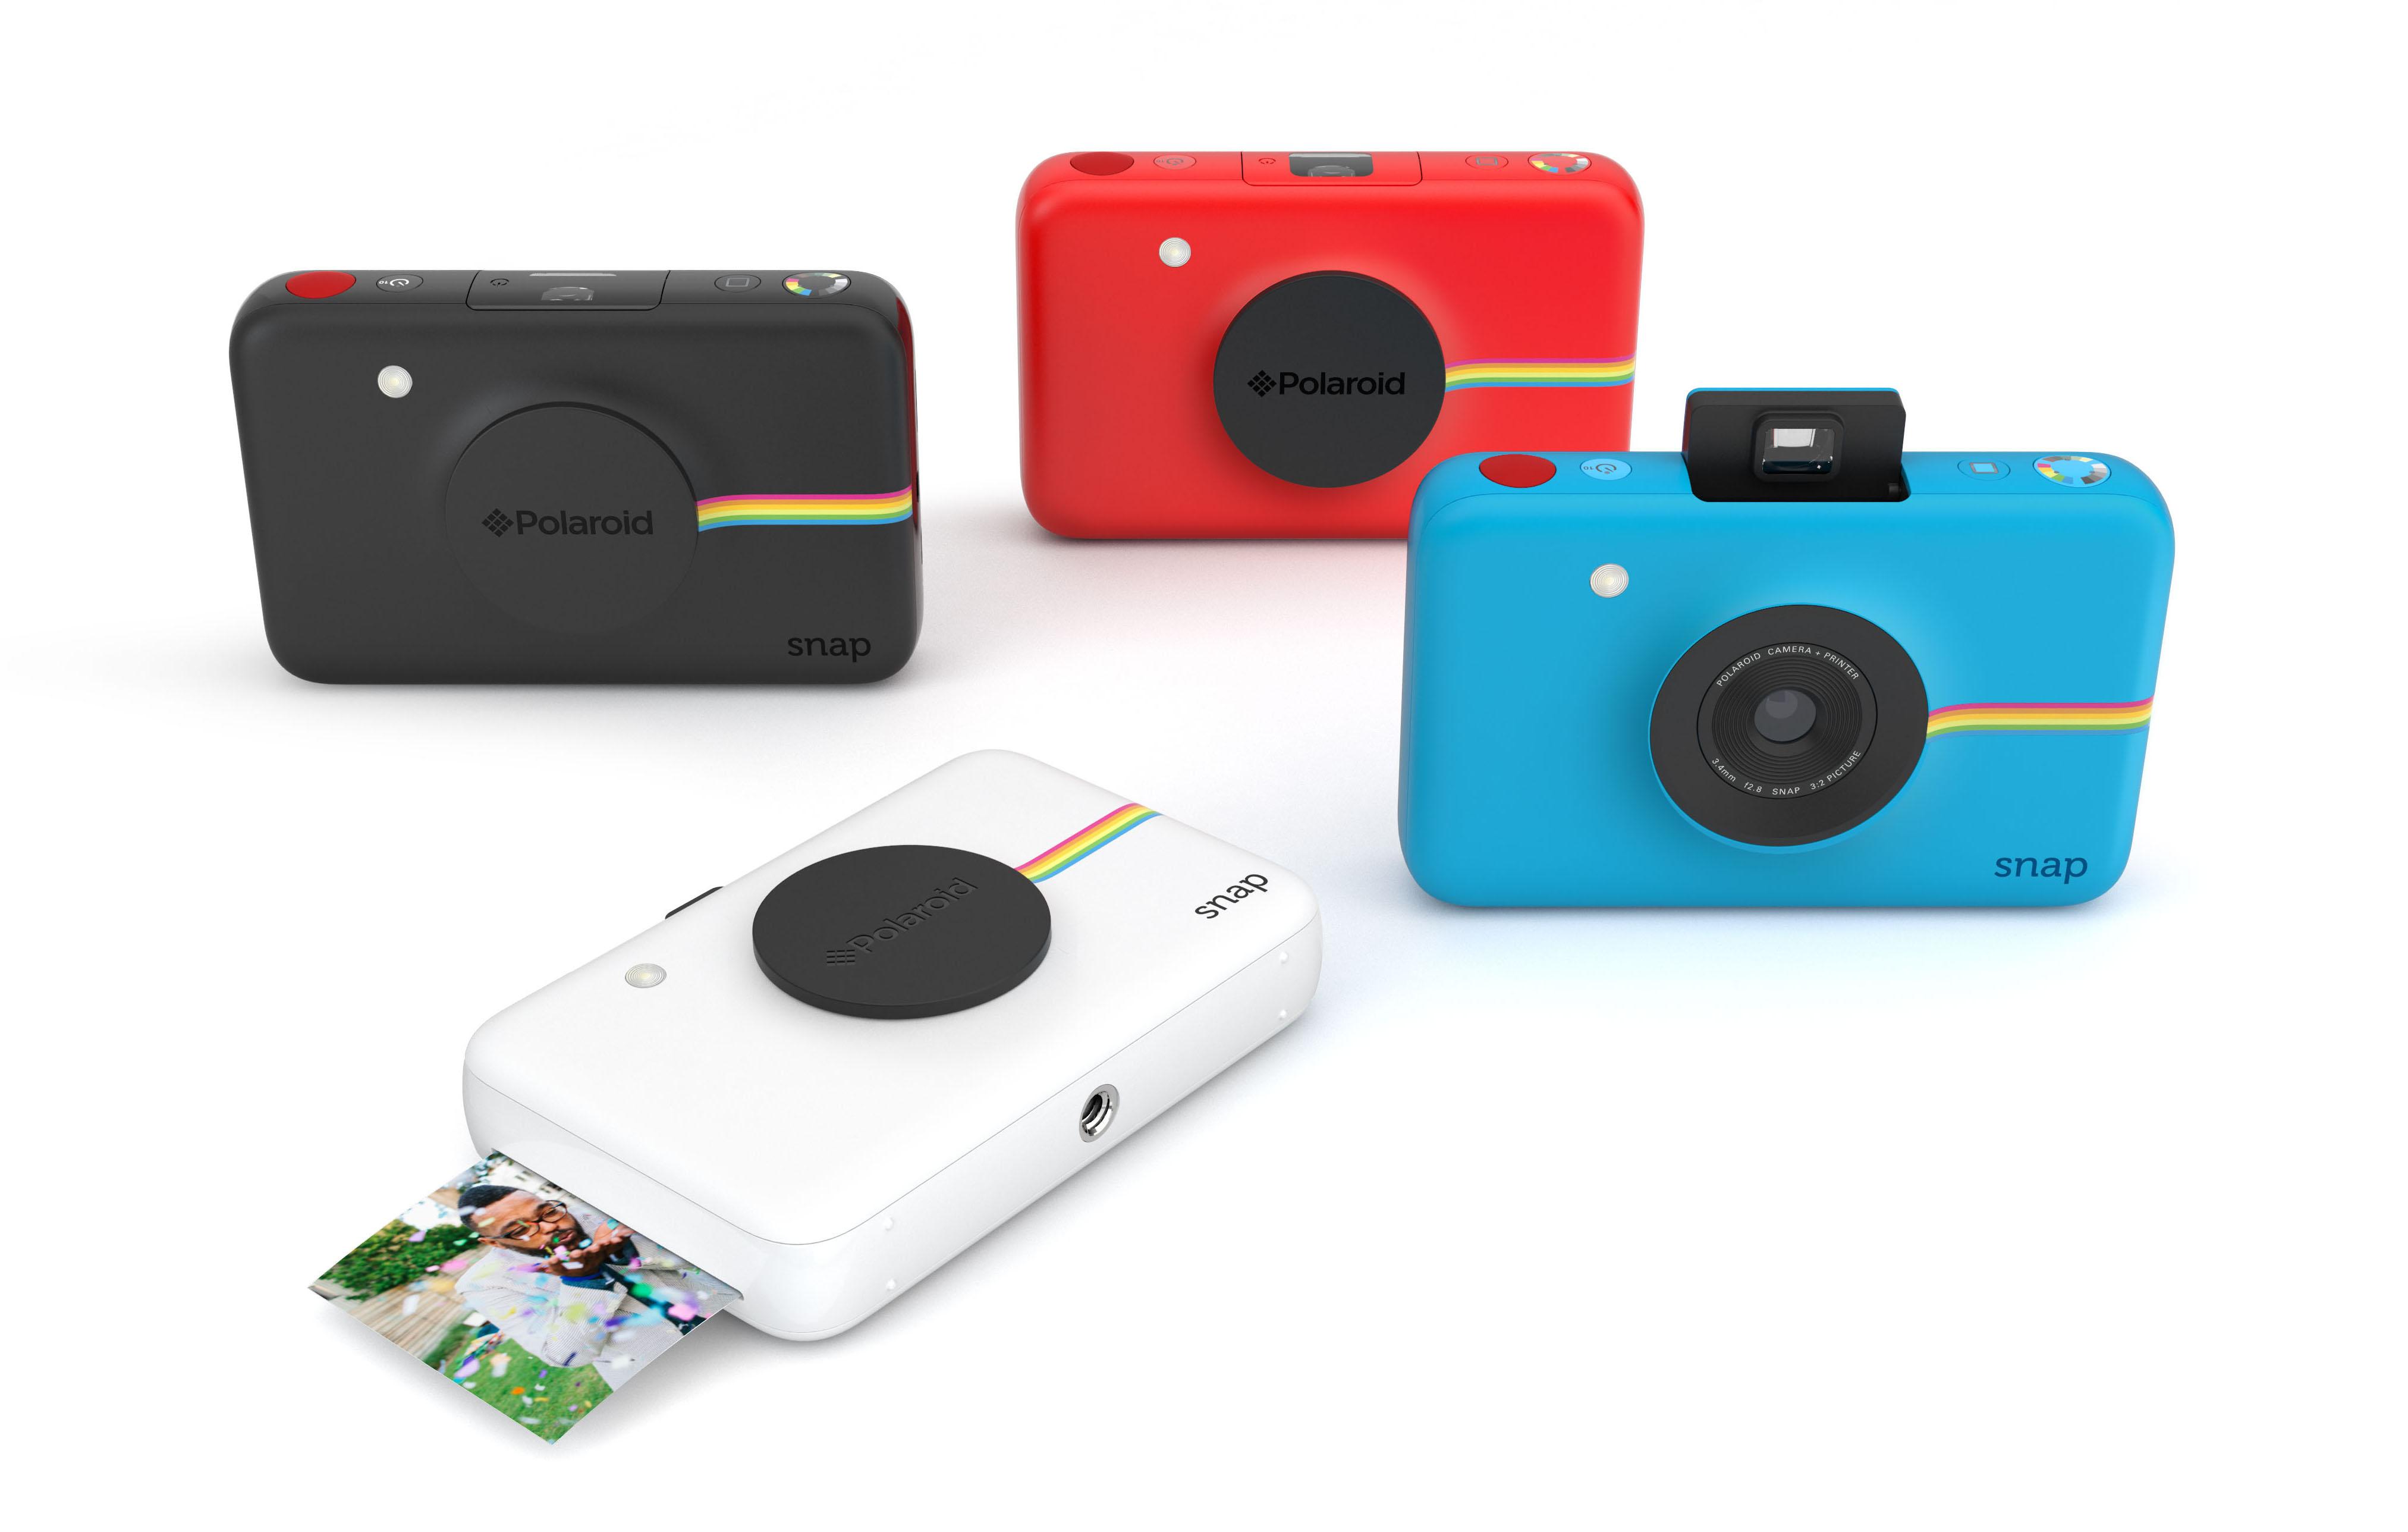 Polaroid Snap instant digital camera prints 2x3